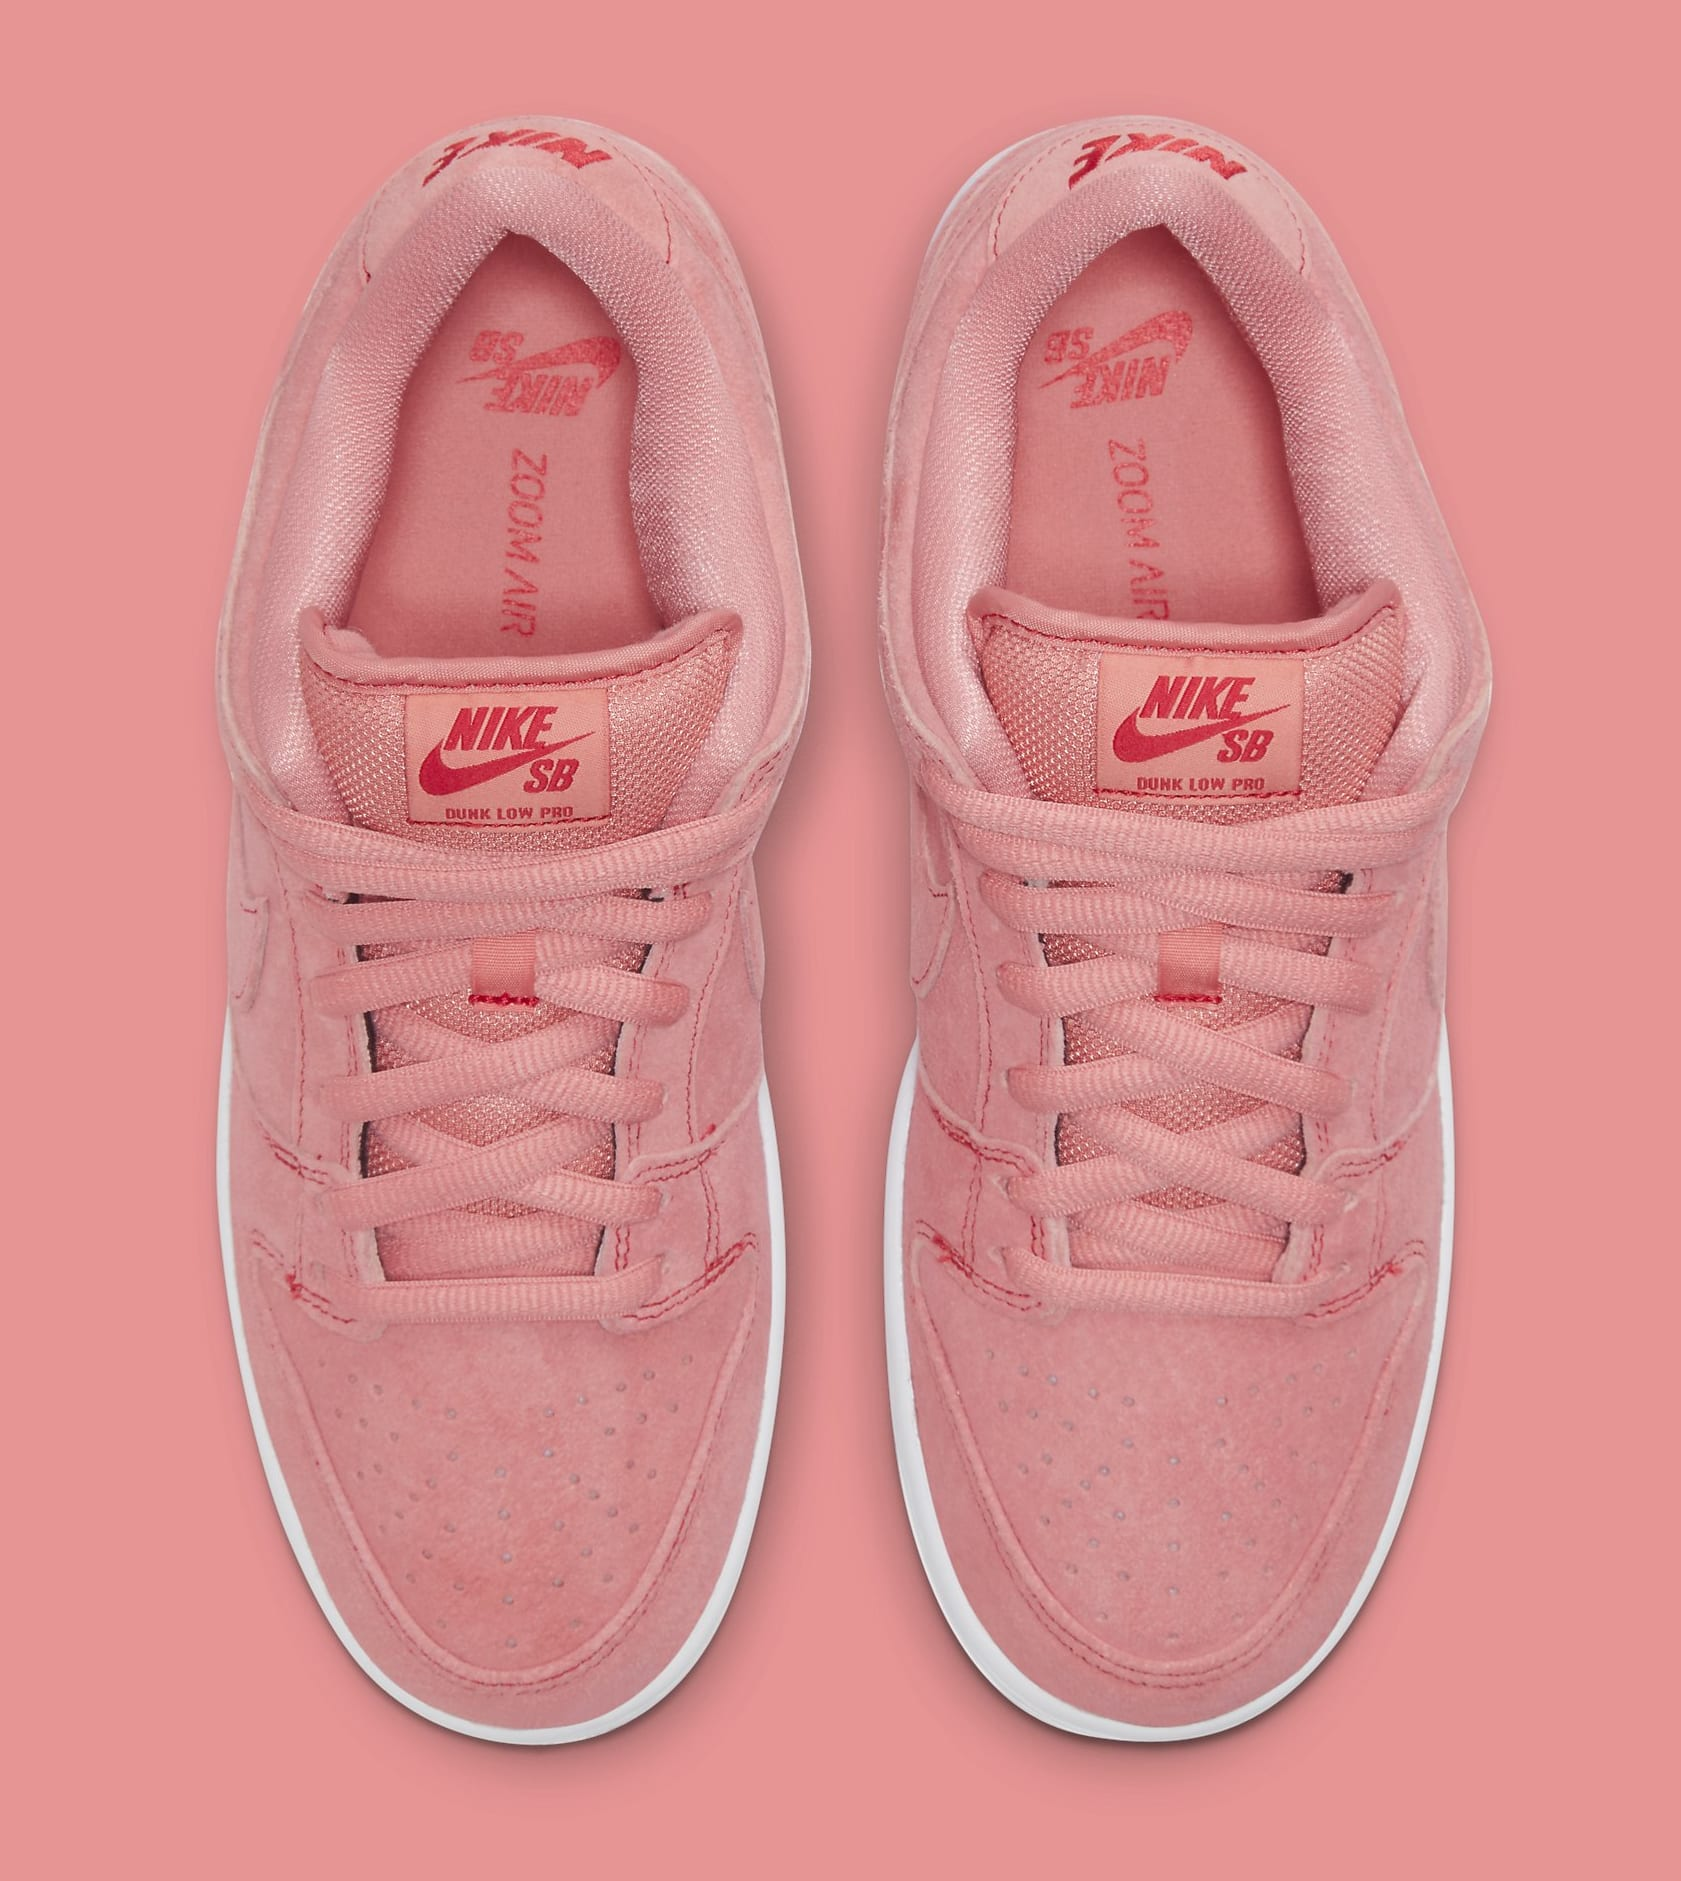 Nike SB Dunk Low 'Pink Pig' CV1655-600 Top